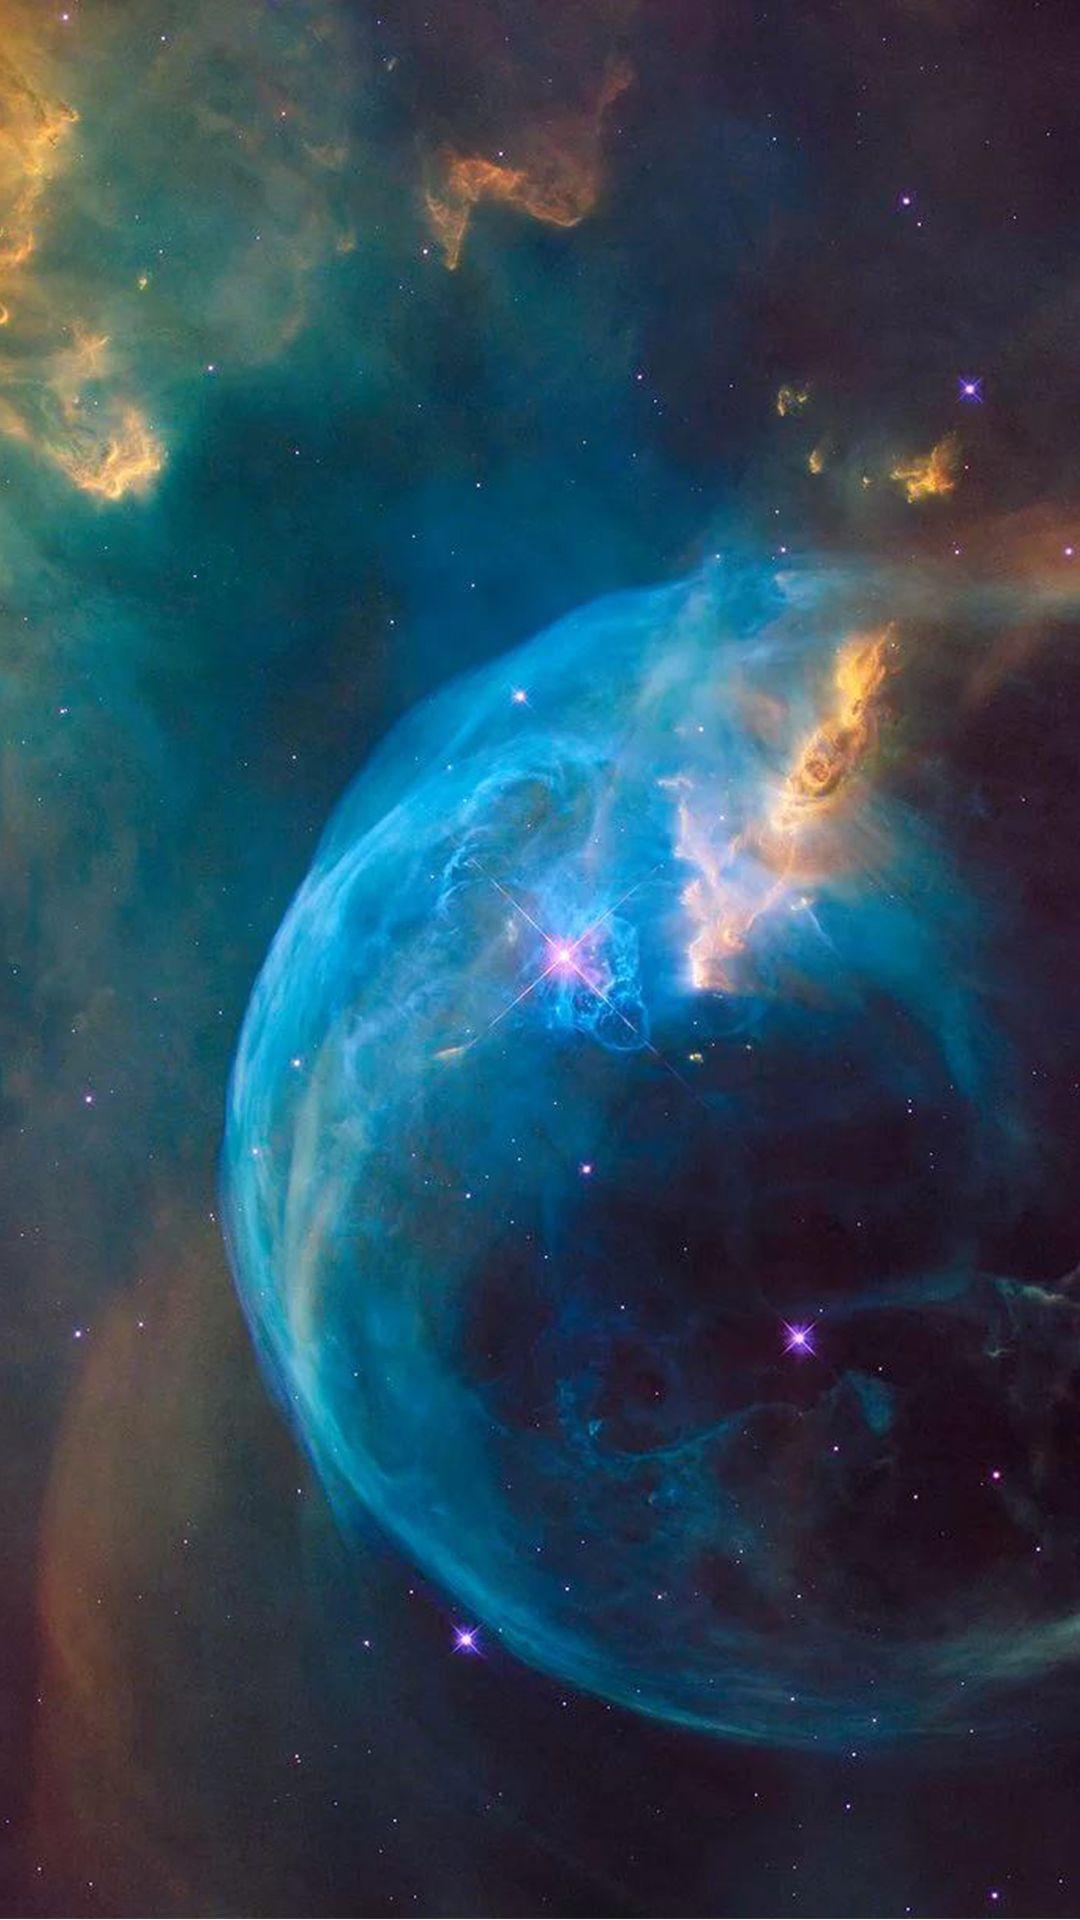 Hubble Supernova Bubble Explosion Iphone 6 Hd Wallpaper Nasa Hubble Space Telescope Nebula